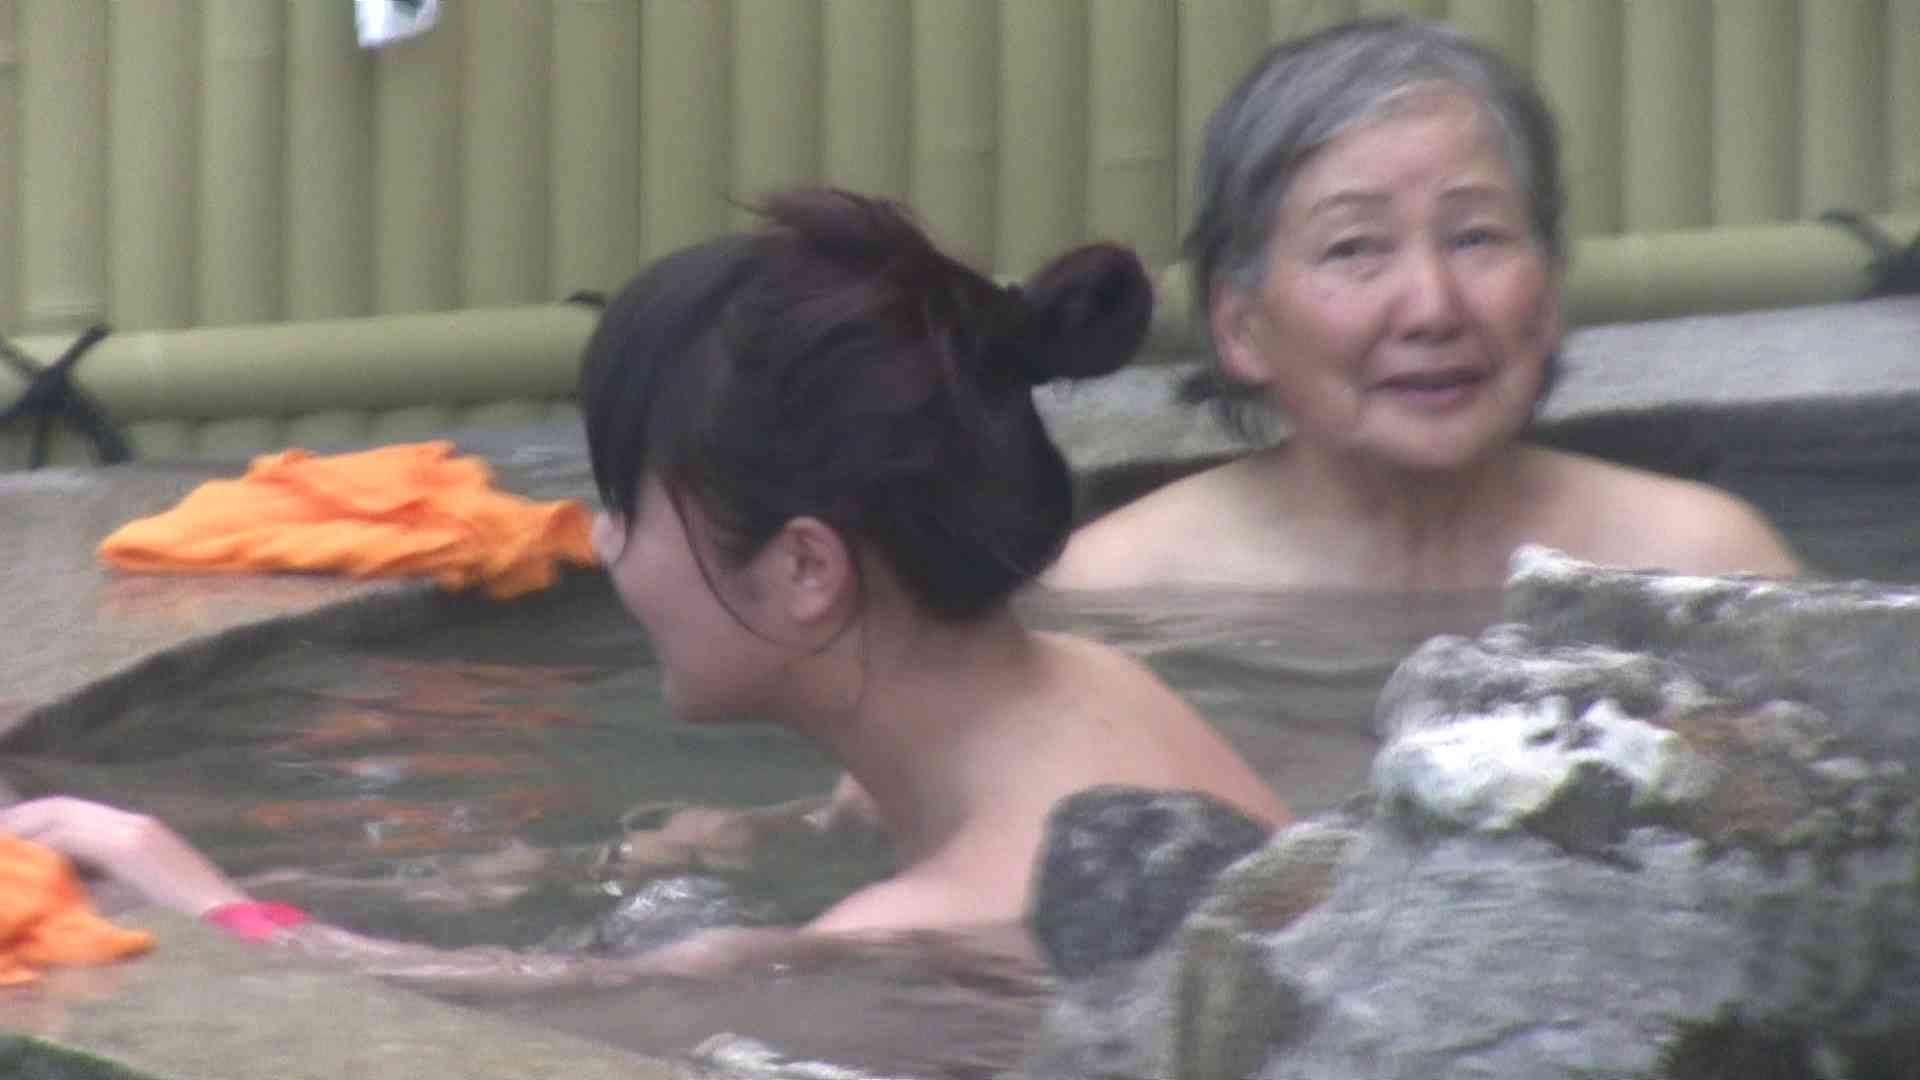 Aquaな露天風呂Vol.118 女体盗撮 隠し撮りAV無料 68連発 14